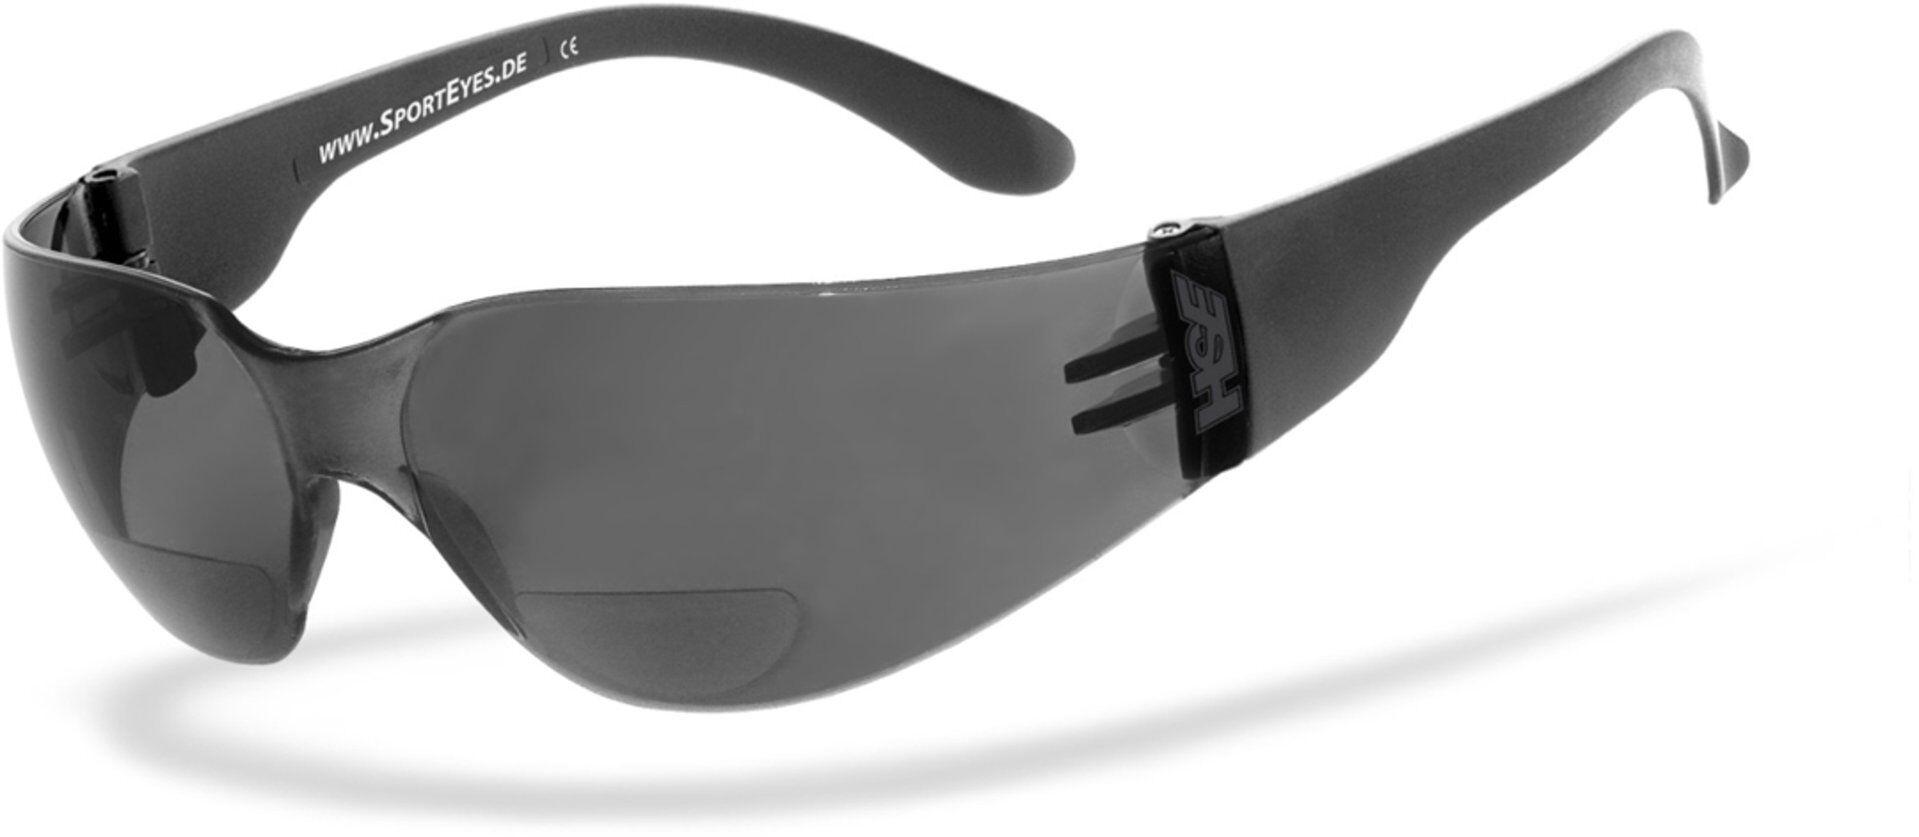 HSE SportEyes HSE Sport Eyes Sprinter 2.3 + 1,00 Sunglasses Black One Size